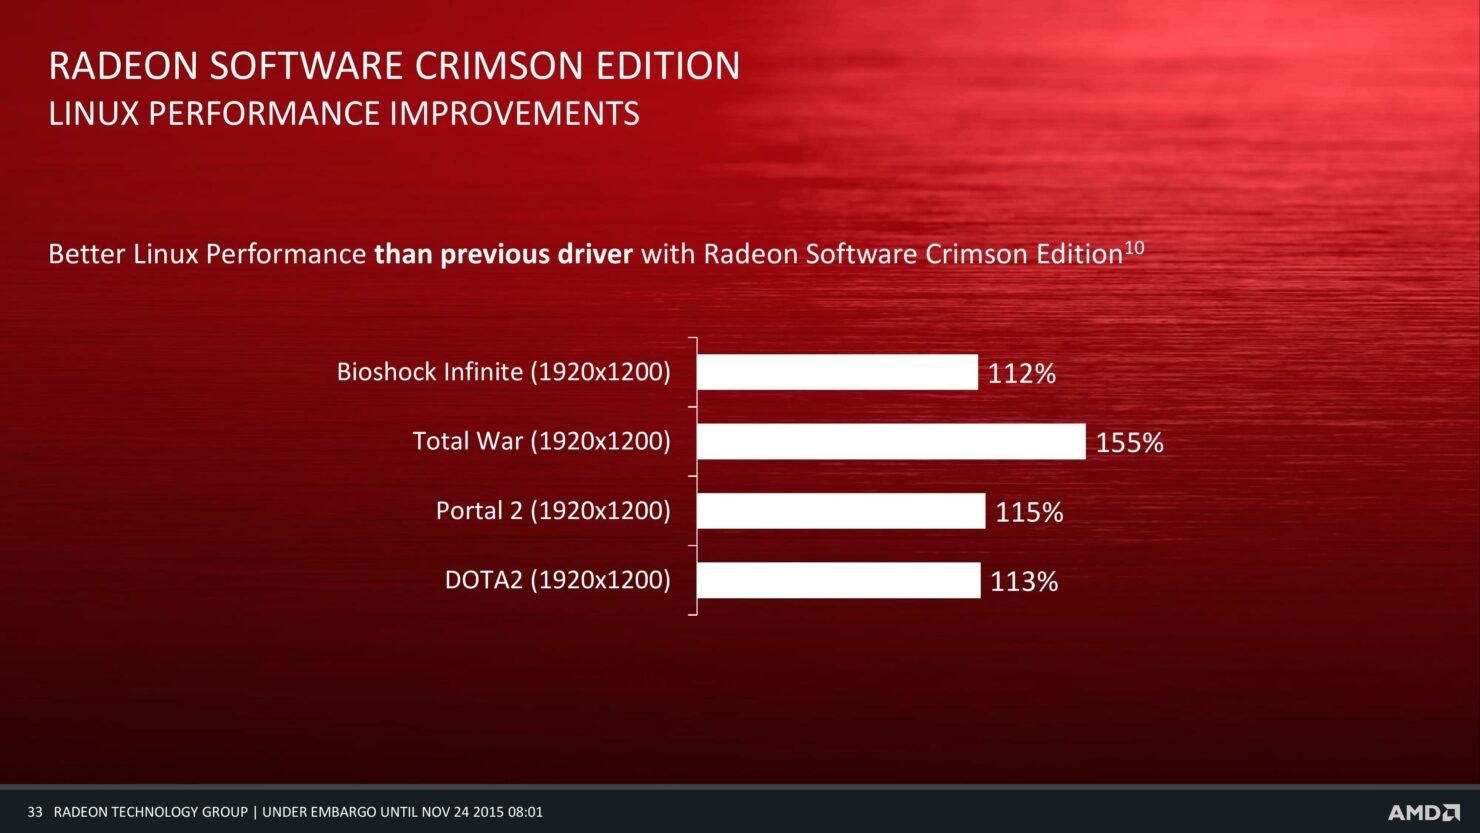 amd-radeon-software-crimson-edition-page-033